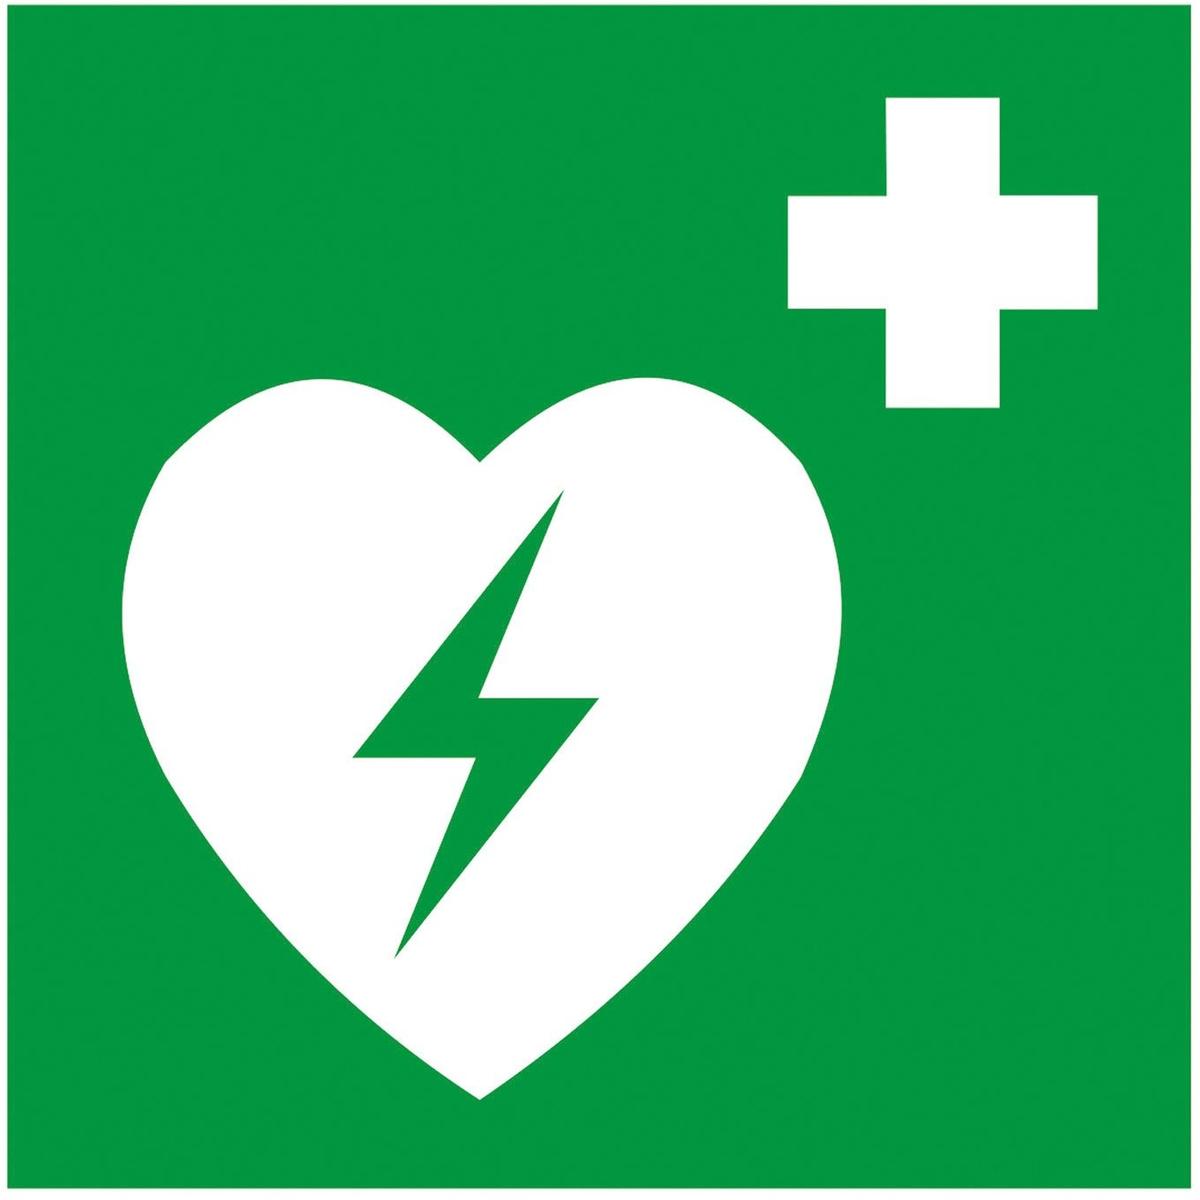 Symbol defibrillator folie selbstklebend 200 x 200 mm for Folie selbstklebend